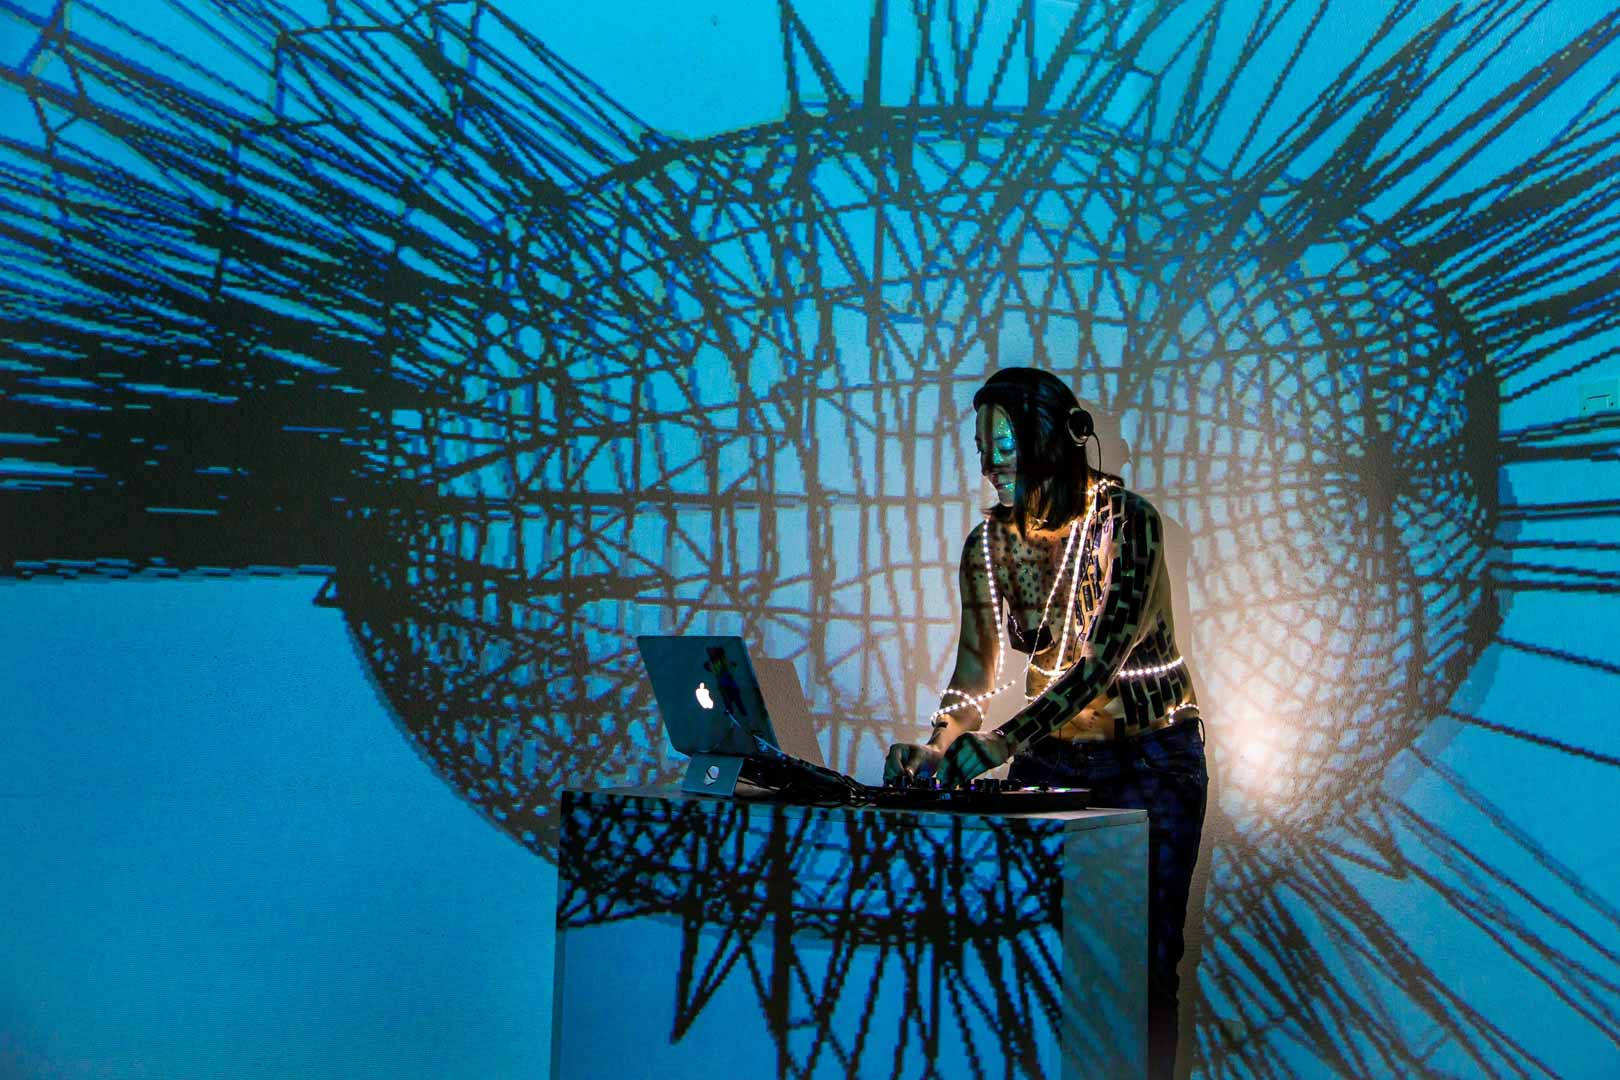 Visuales Nidra Eternity immersive projections mapping vj Christel Bocksang Nilda Ayala Nildaya Nildayala